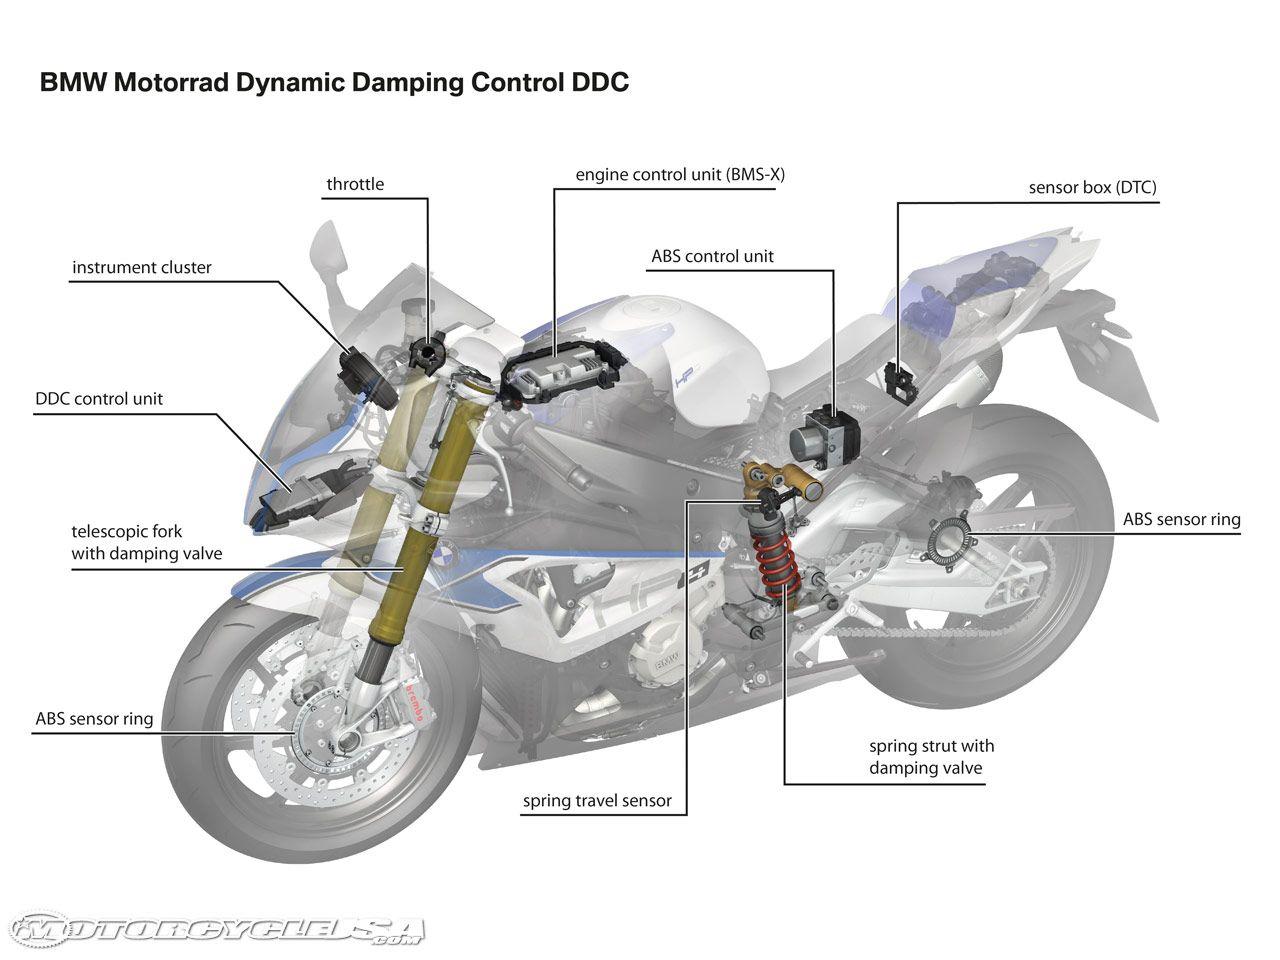 motorcycle parts diagram image collections diagram design ideas rh pooptronica com motorcycle diagram engine motorcycle diagram with label pdf